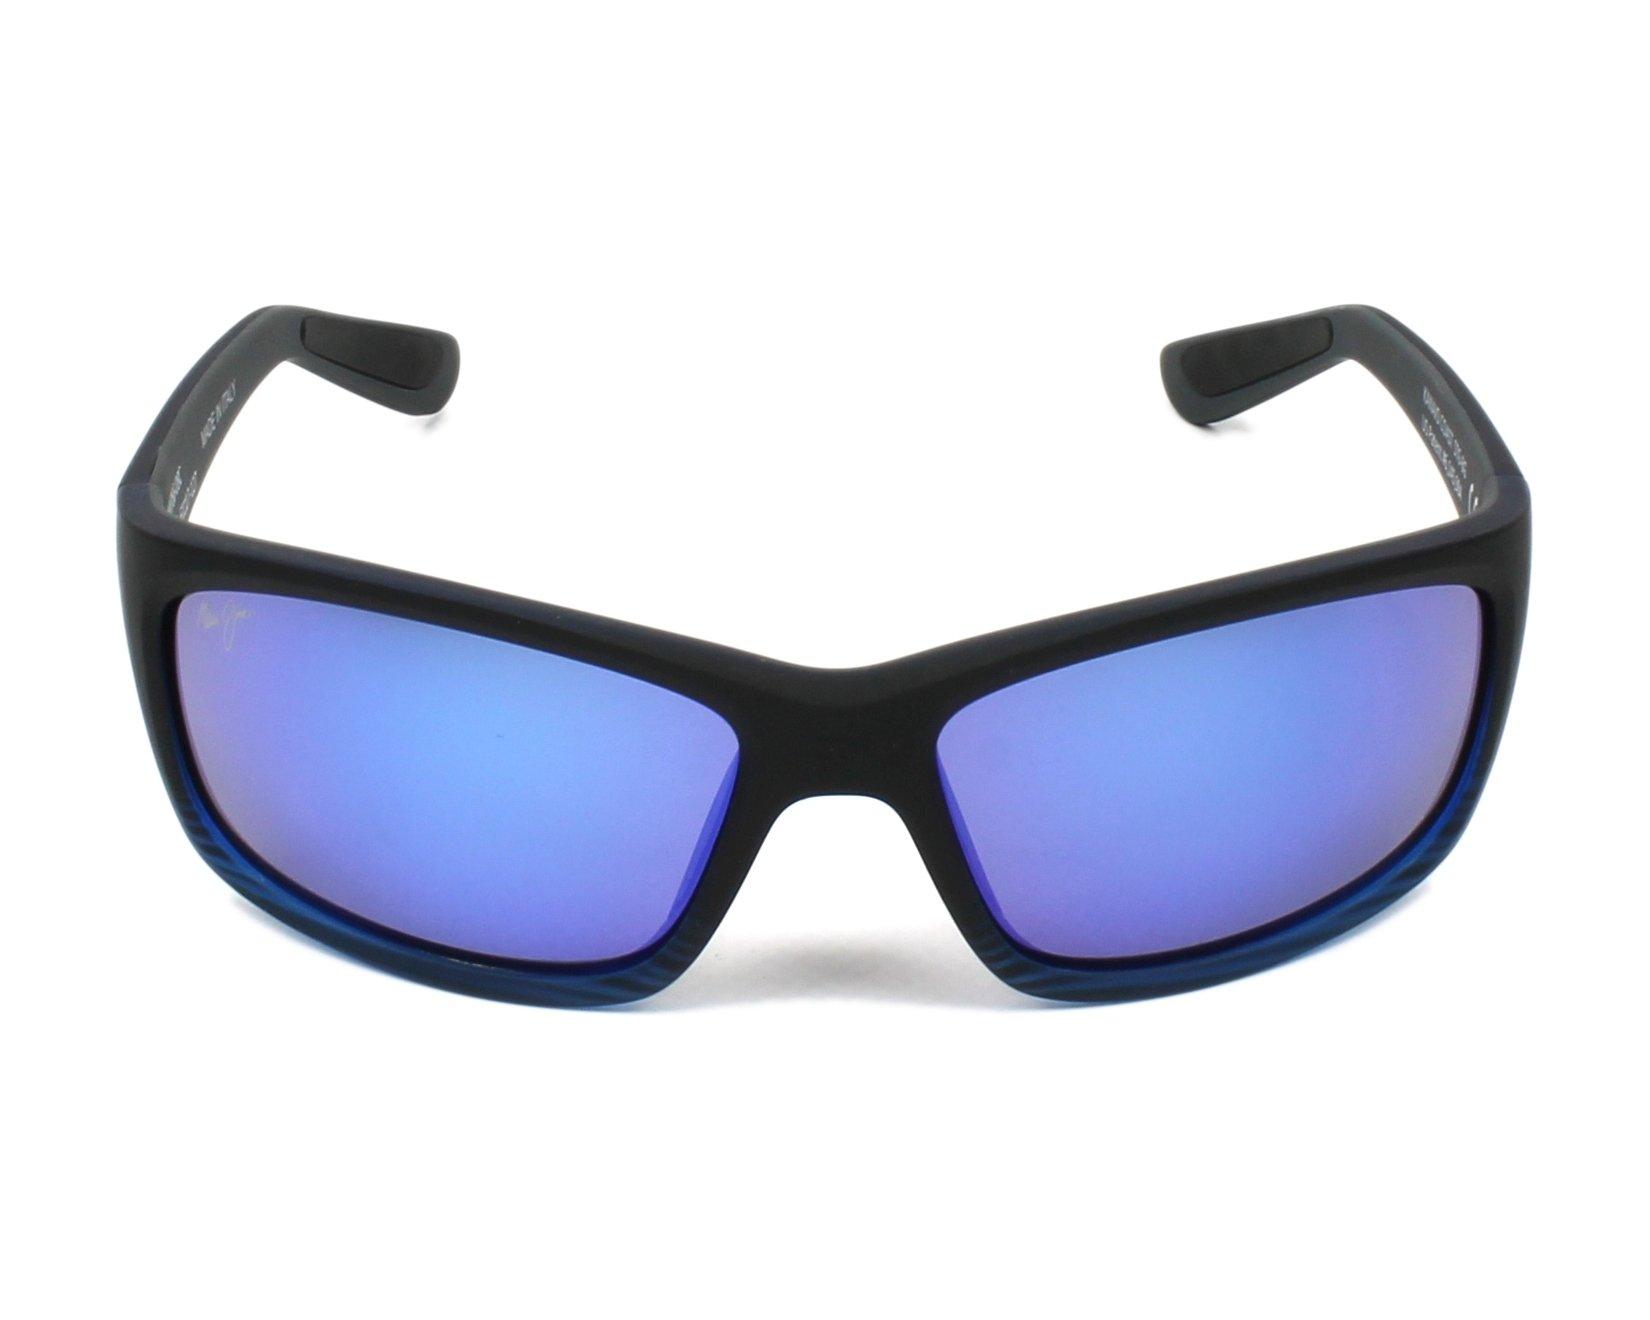 efd82fc96b Sunglasses Maui Jim B-766 08C 61-17 Black front view